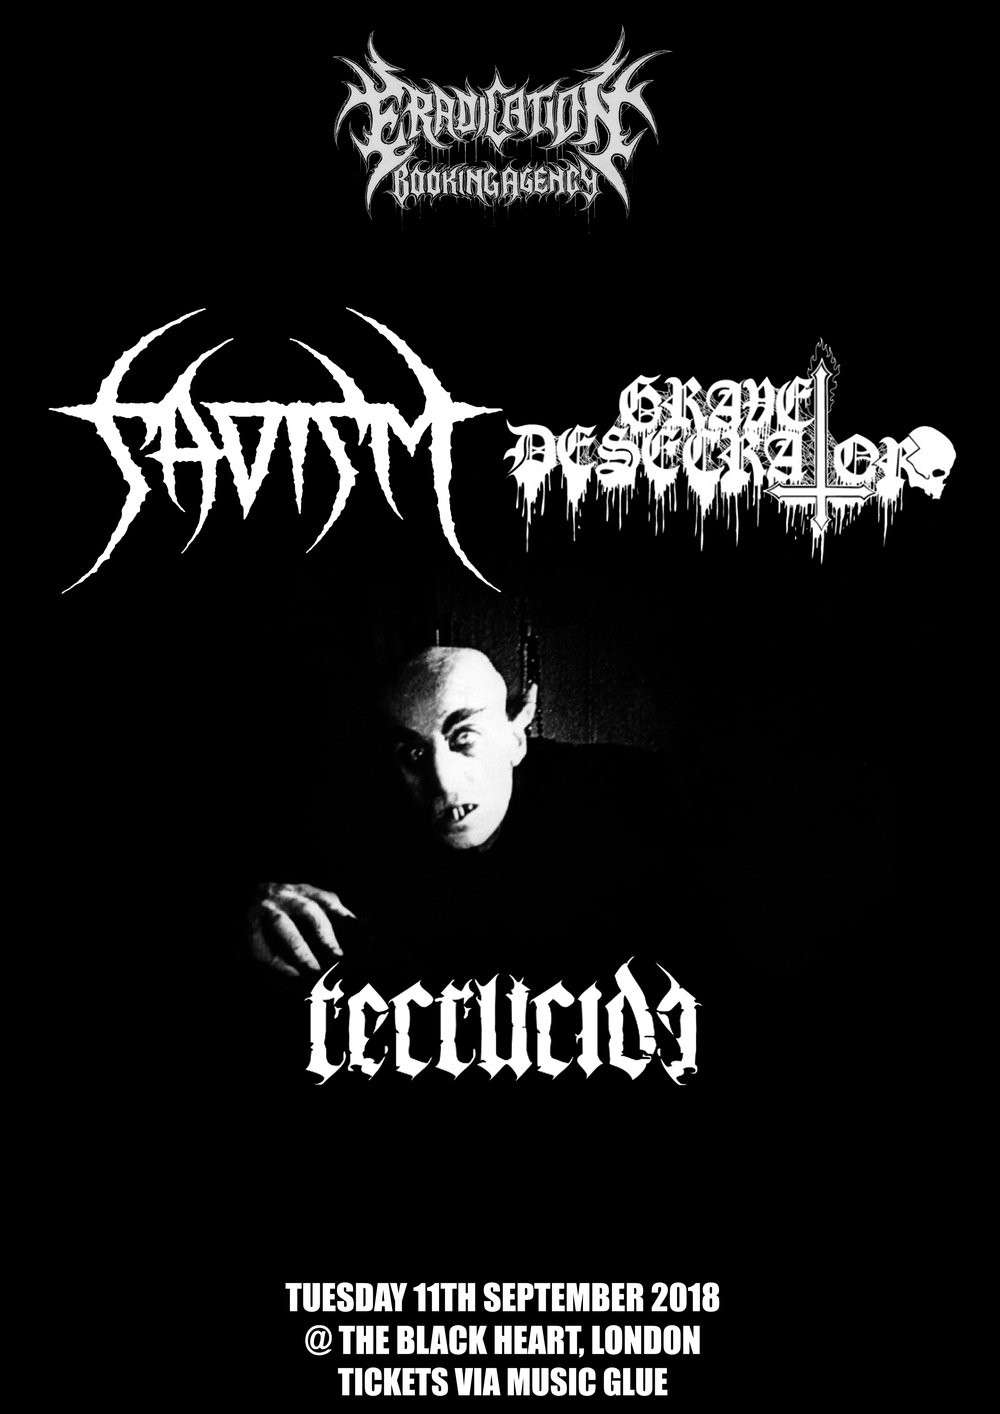 Sadism Grave Desecrator London.jpg